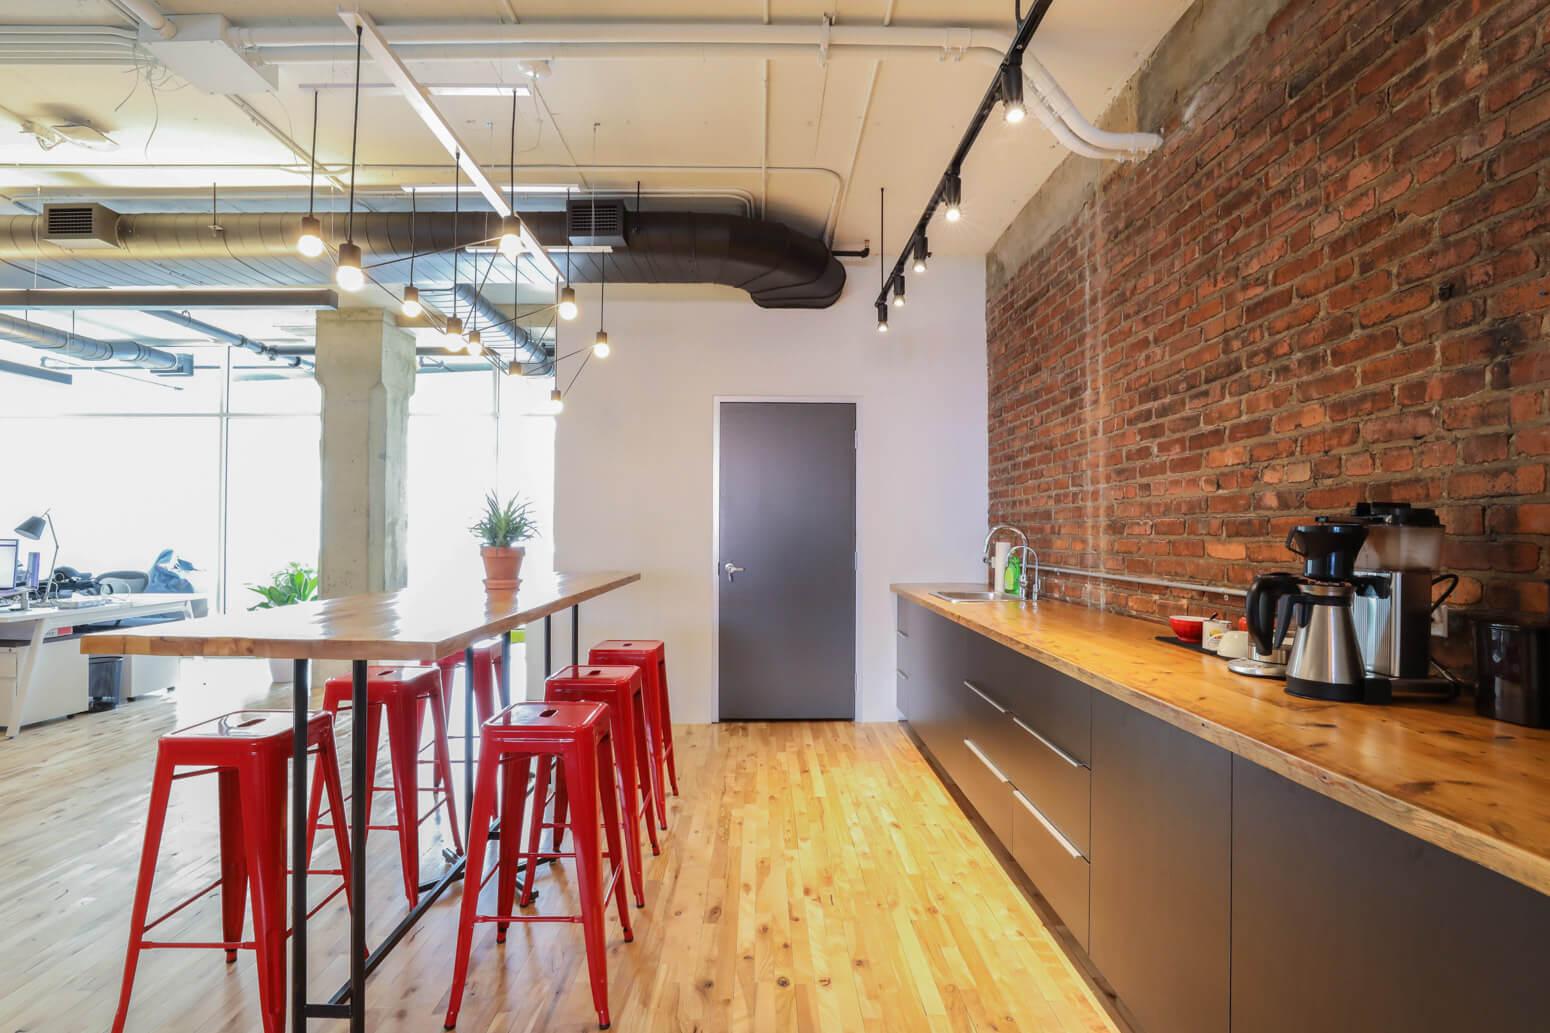 Shutterstock Montreal Office Killer Spaces-2